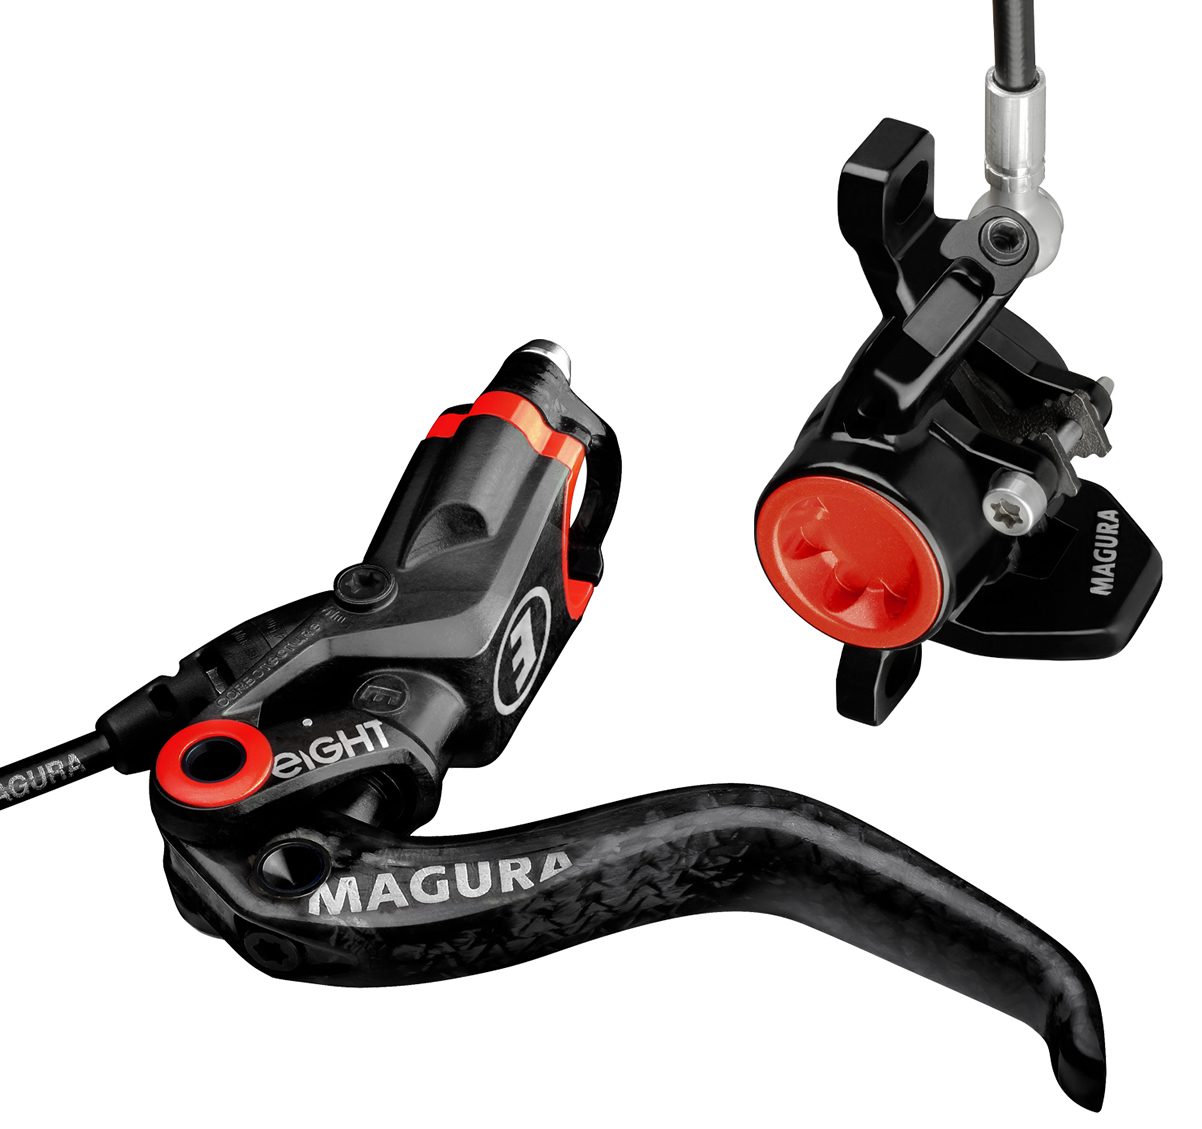 Power Stop Brakes Review >> Buy cheap disc brakes for mountainbikes & mtb - starbike.com